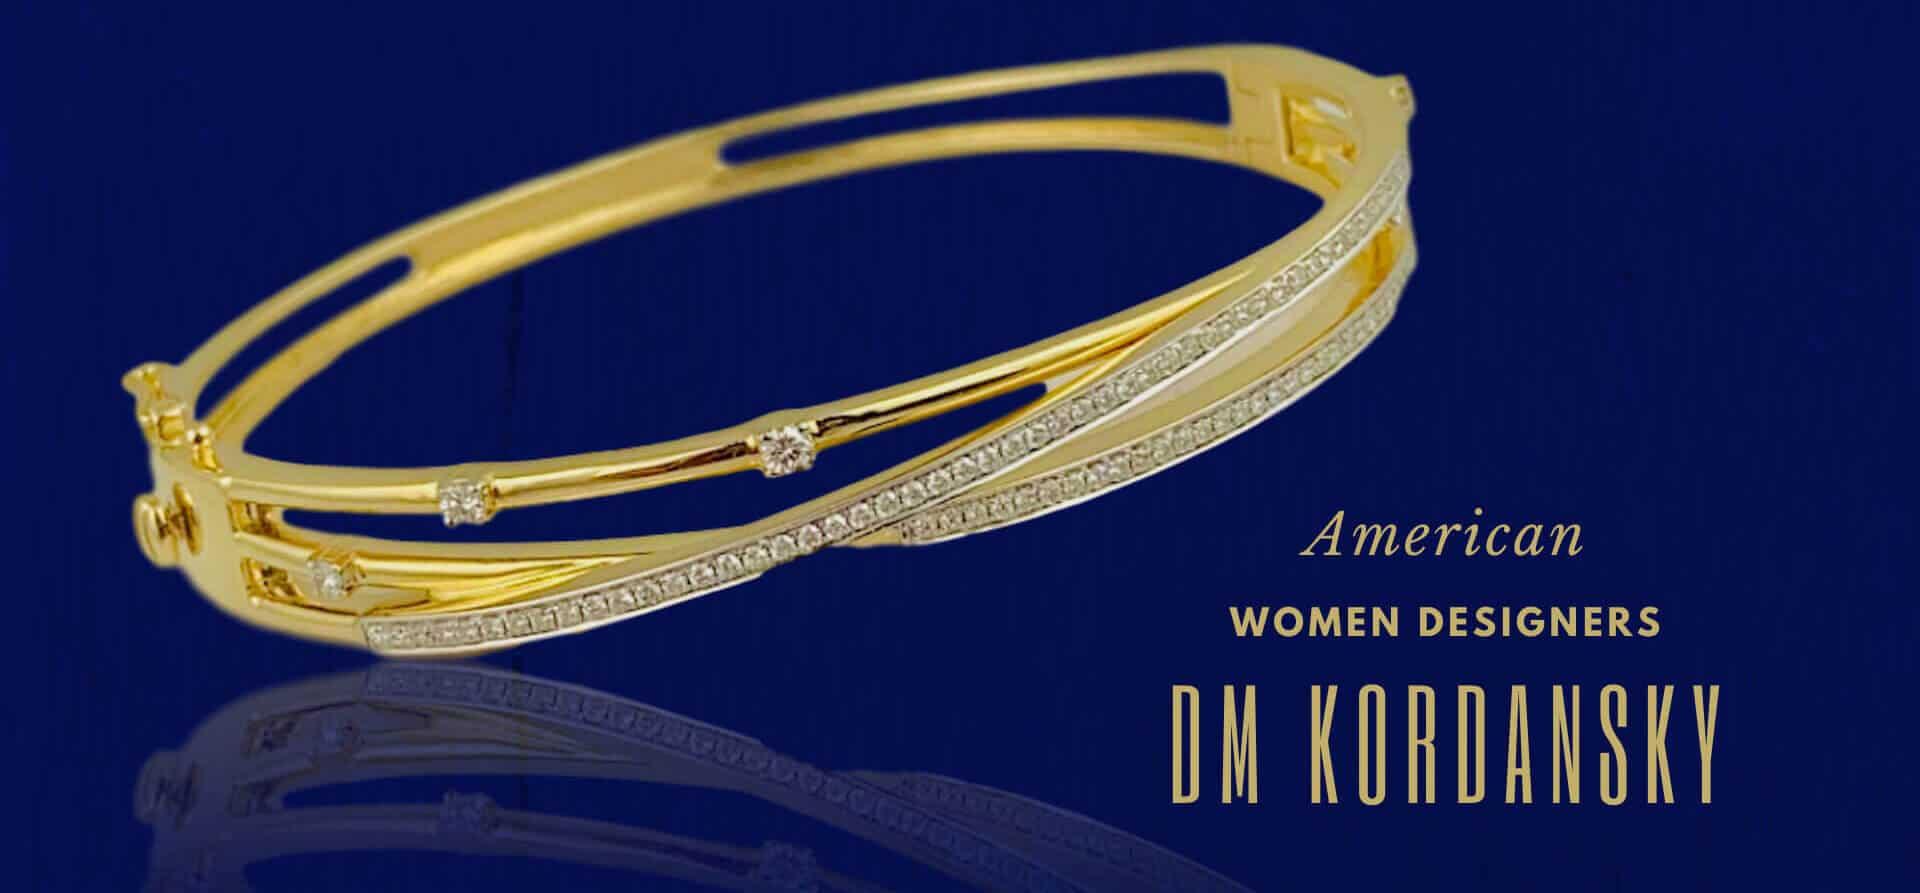 American women designers DM Kordansky